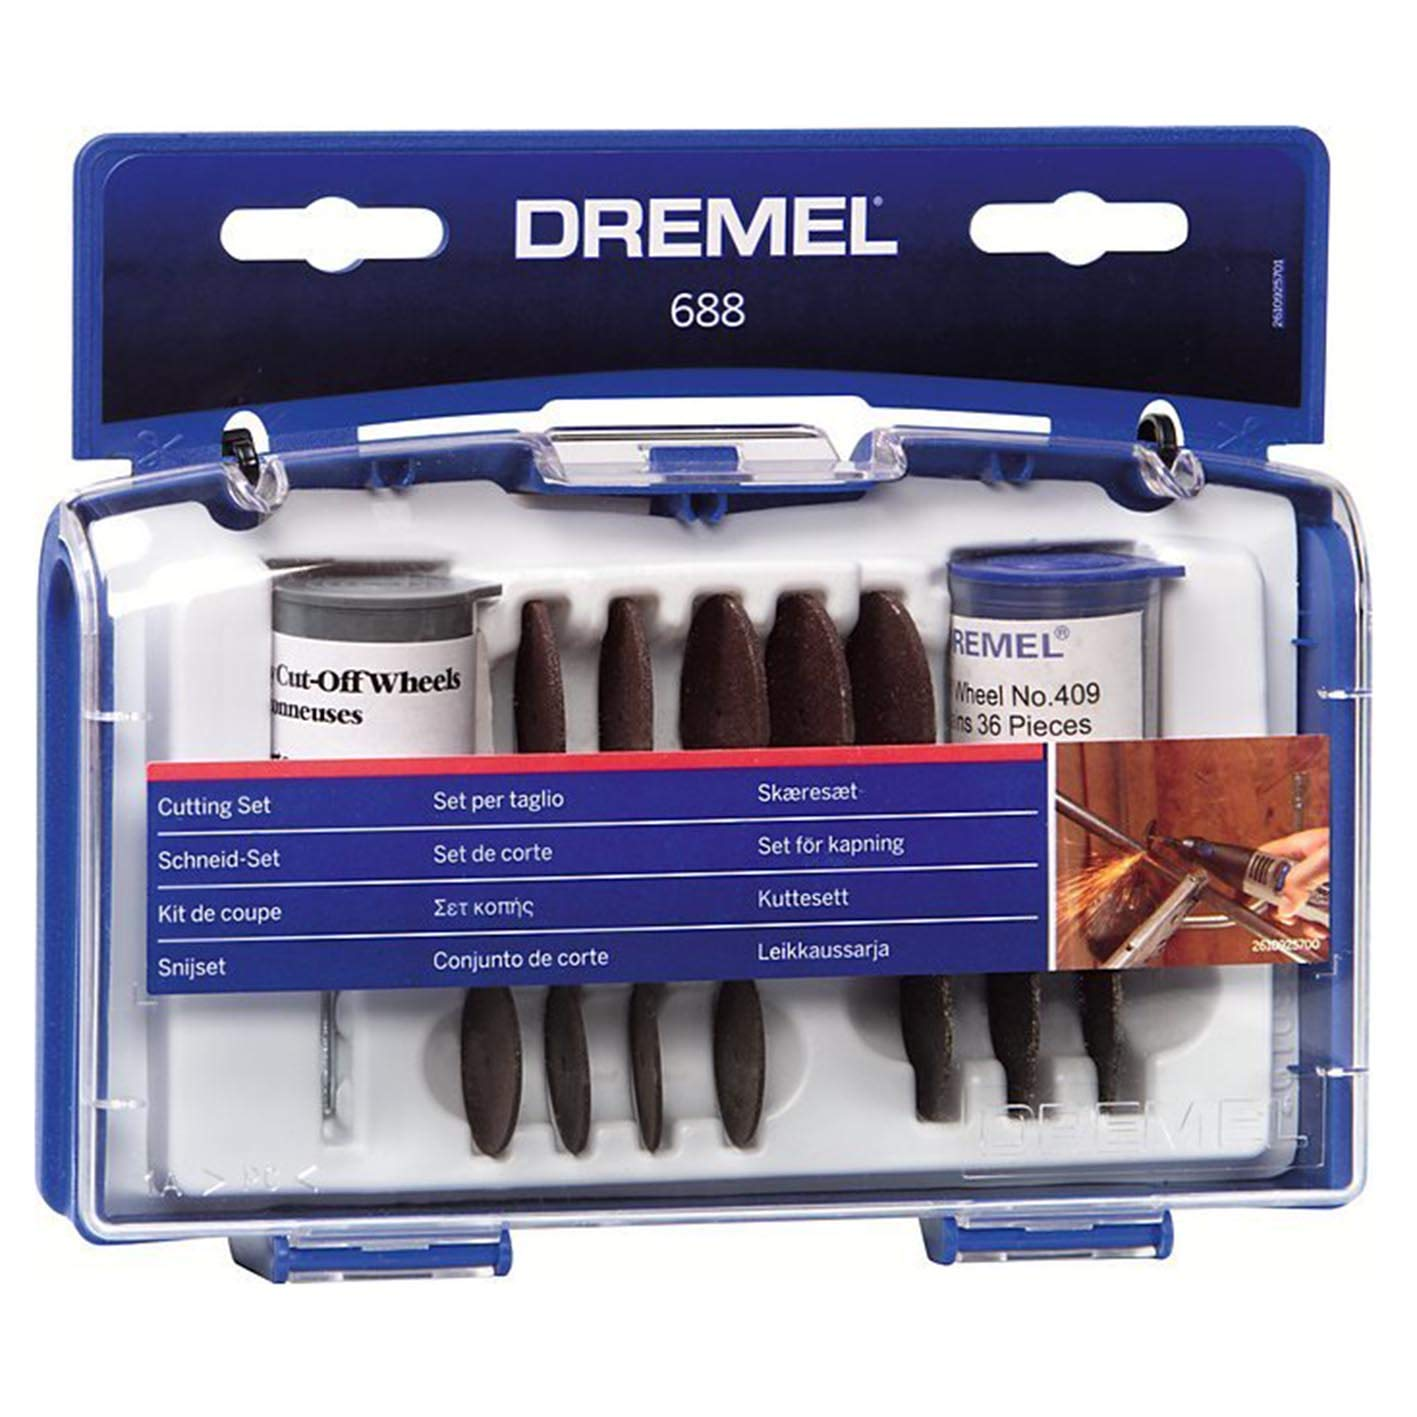 Dremel 688-01 69-Piece Rotary Tool Accessory Cutting Disc Kit